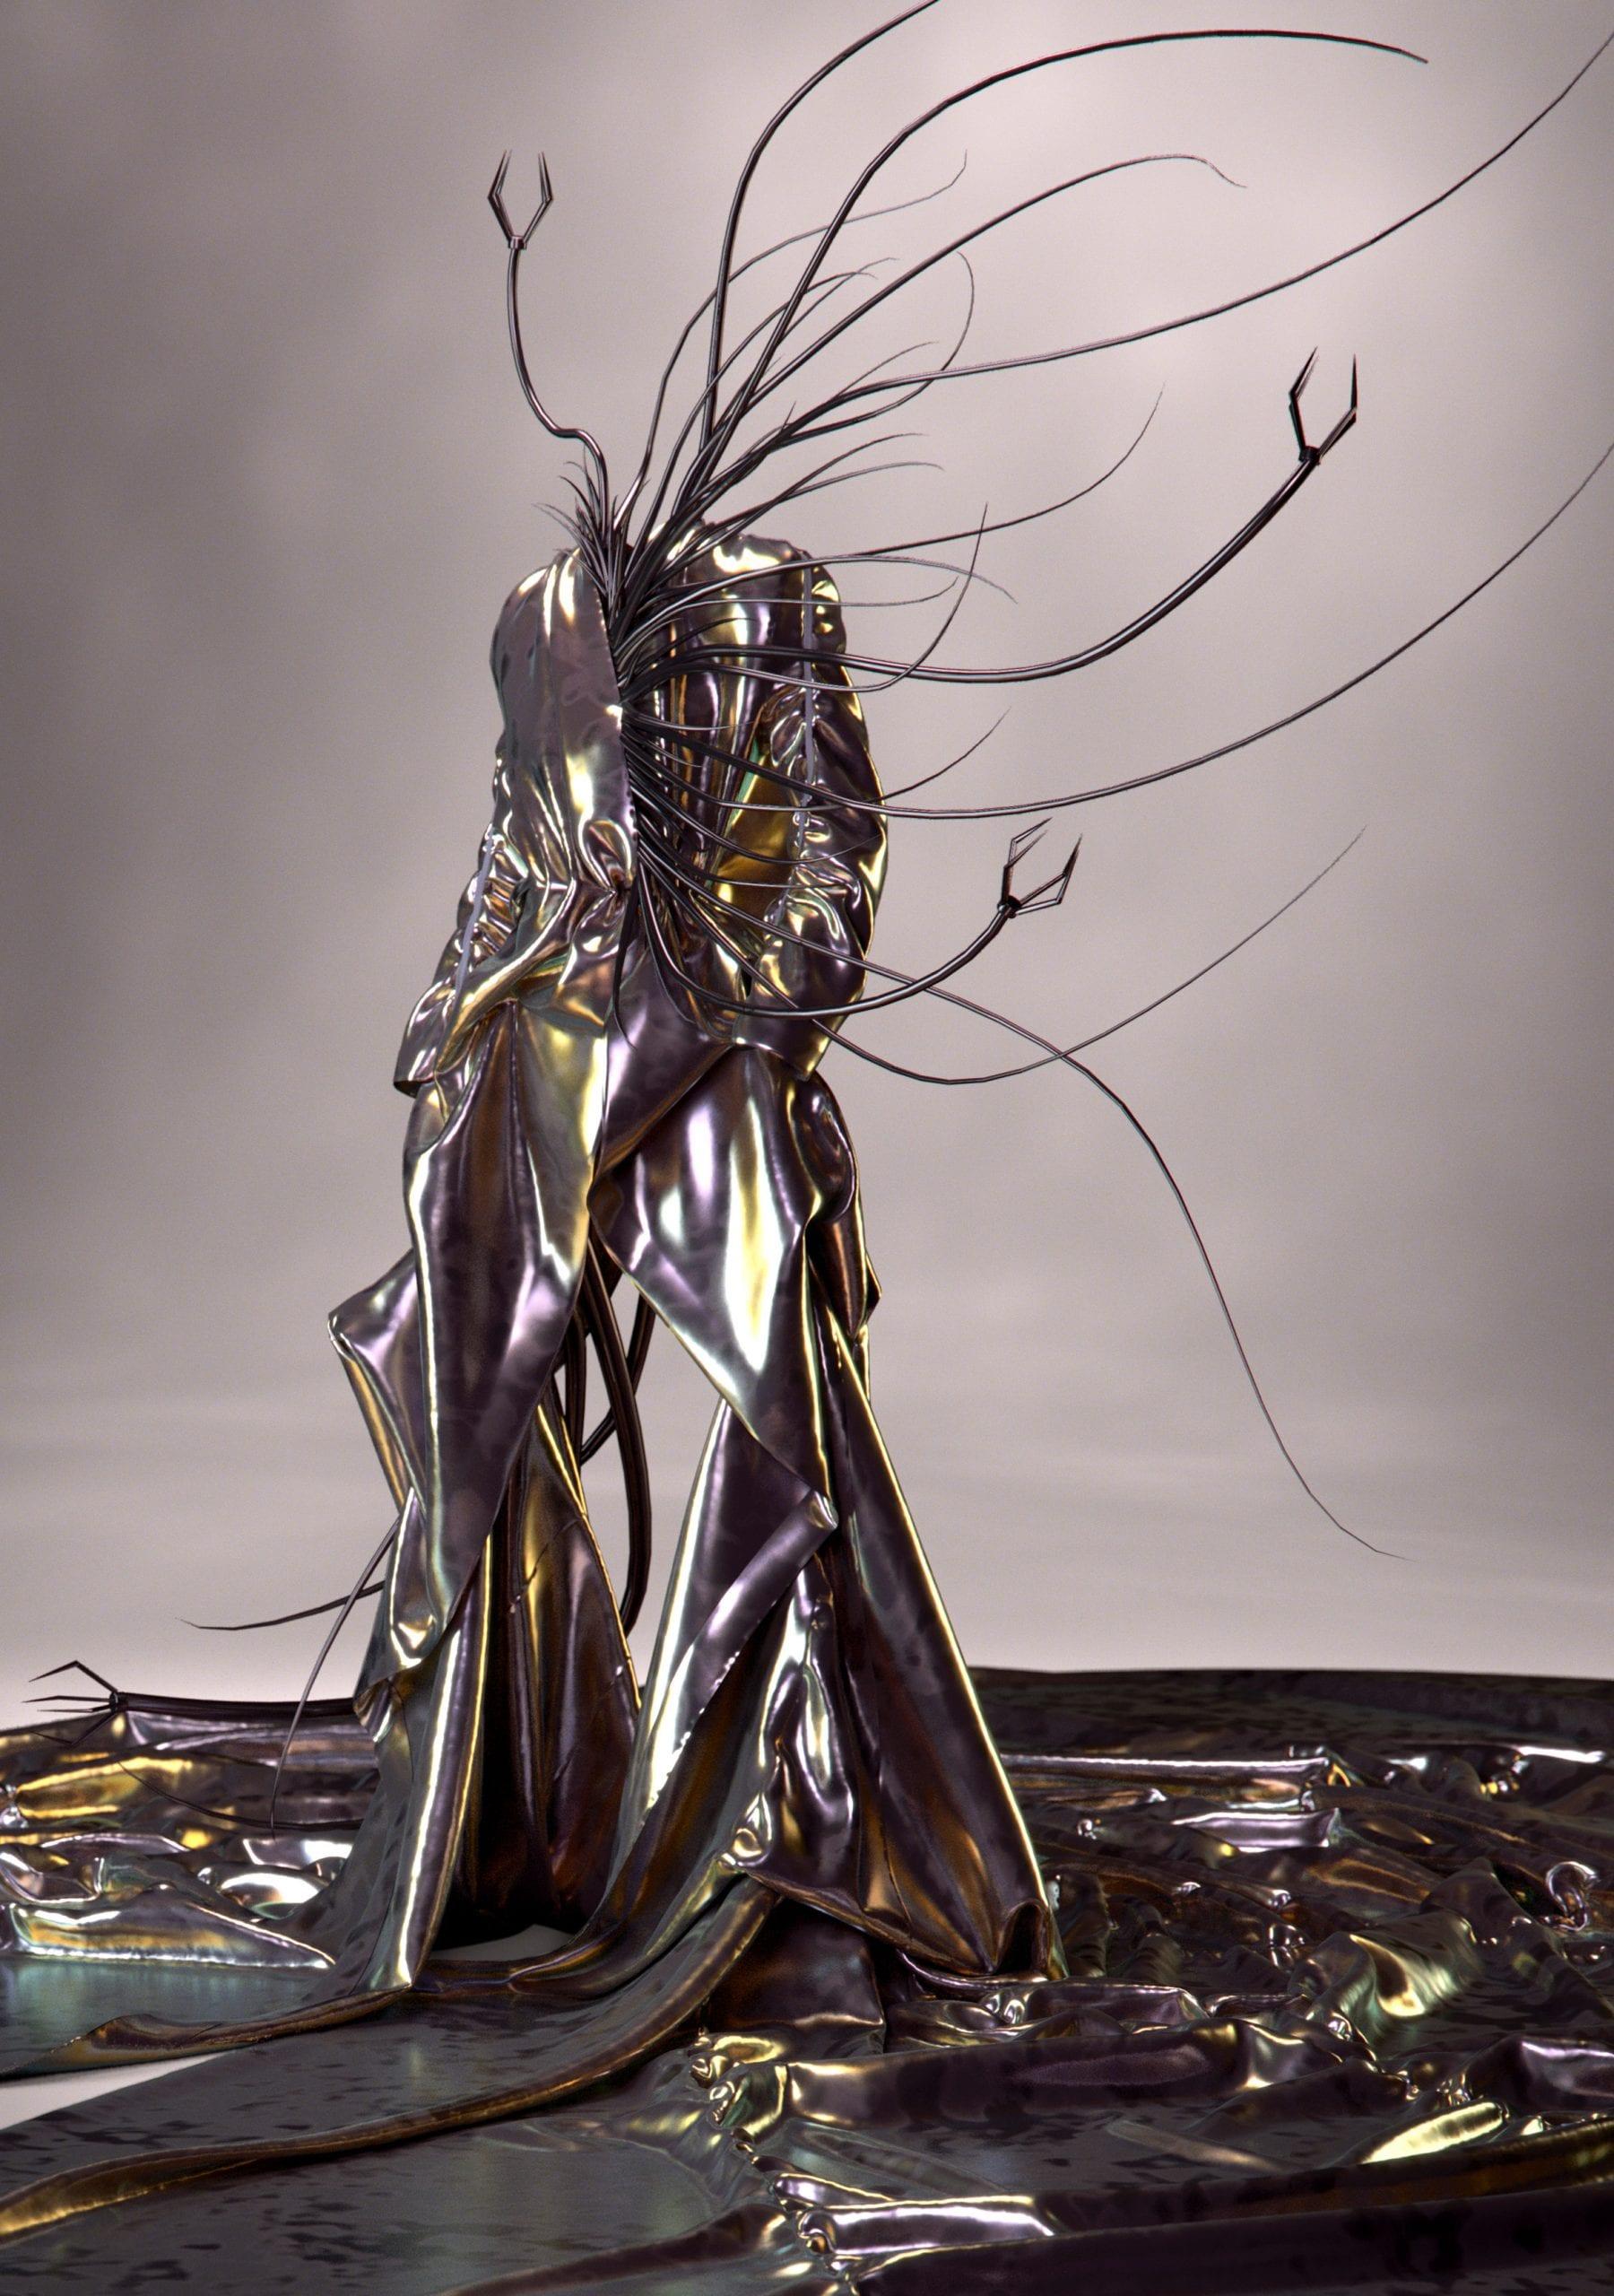 Toni Maticevski worked on the virtual garment